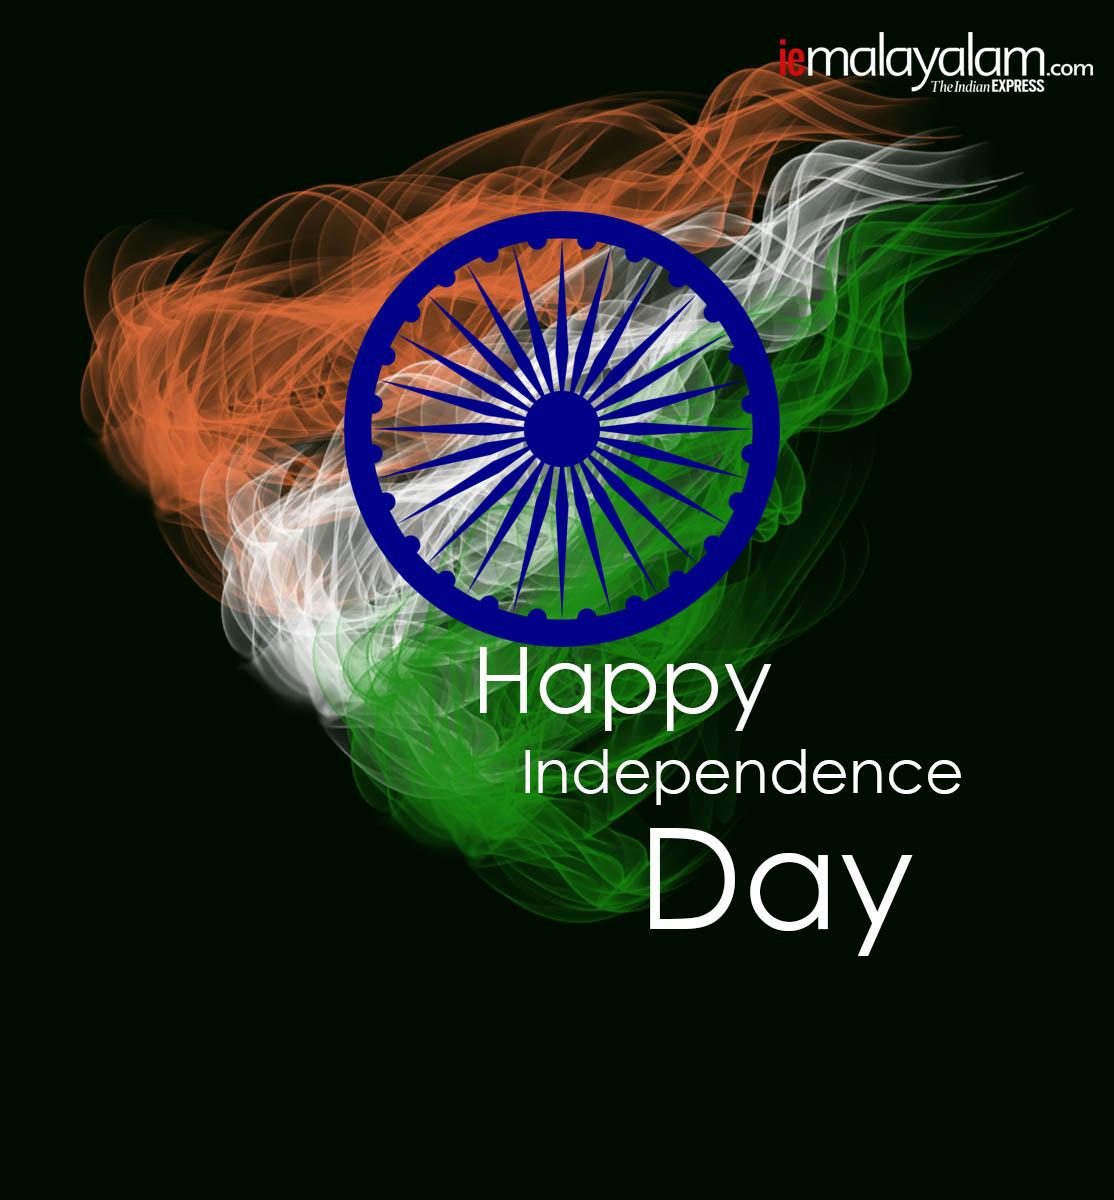 india independence day, Swatantrata diwas 2019, Independence Day, Independence Day 2019, Happy Independence Day, 15 August Independence Day, India News, Live News, Independence Day News, Happy Independence Day 2019, 15 August History, 15 August Significance, 15 August Importanc, eസ്വാതന്ത്ര്യദിനം, ആശംസകള്, സന്ദേശങ്ങള്, സ്വാതന്ത്ര്യദിന പ്രസംഗം